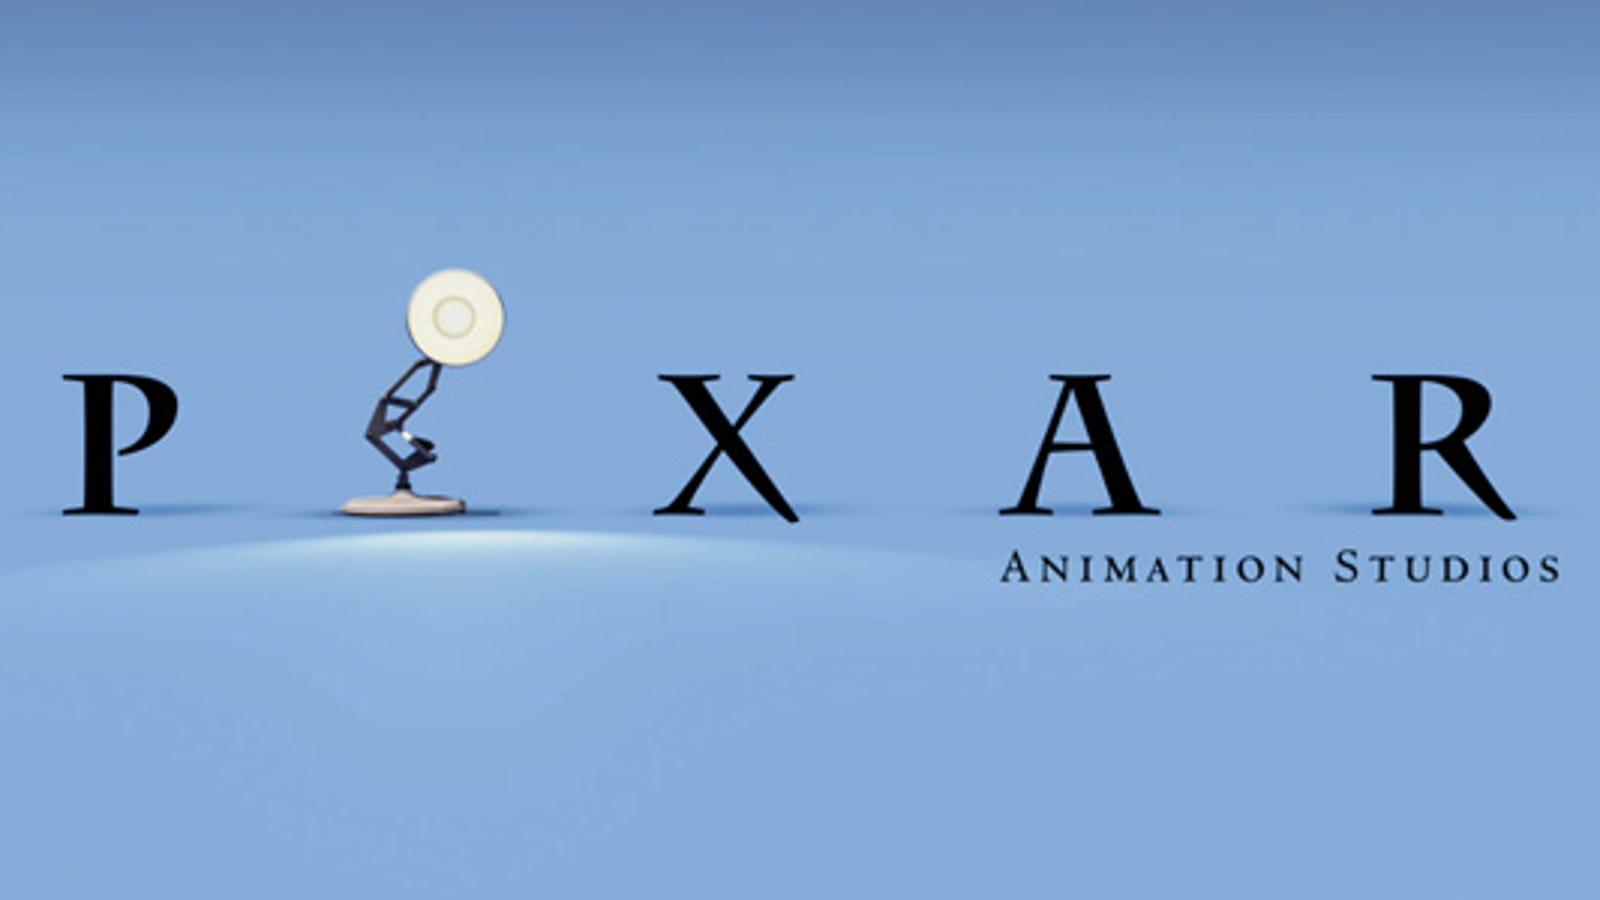 the sordid story of the pixar lamp